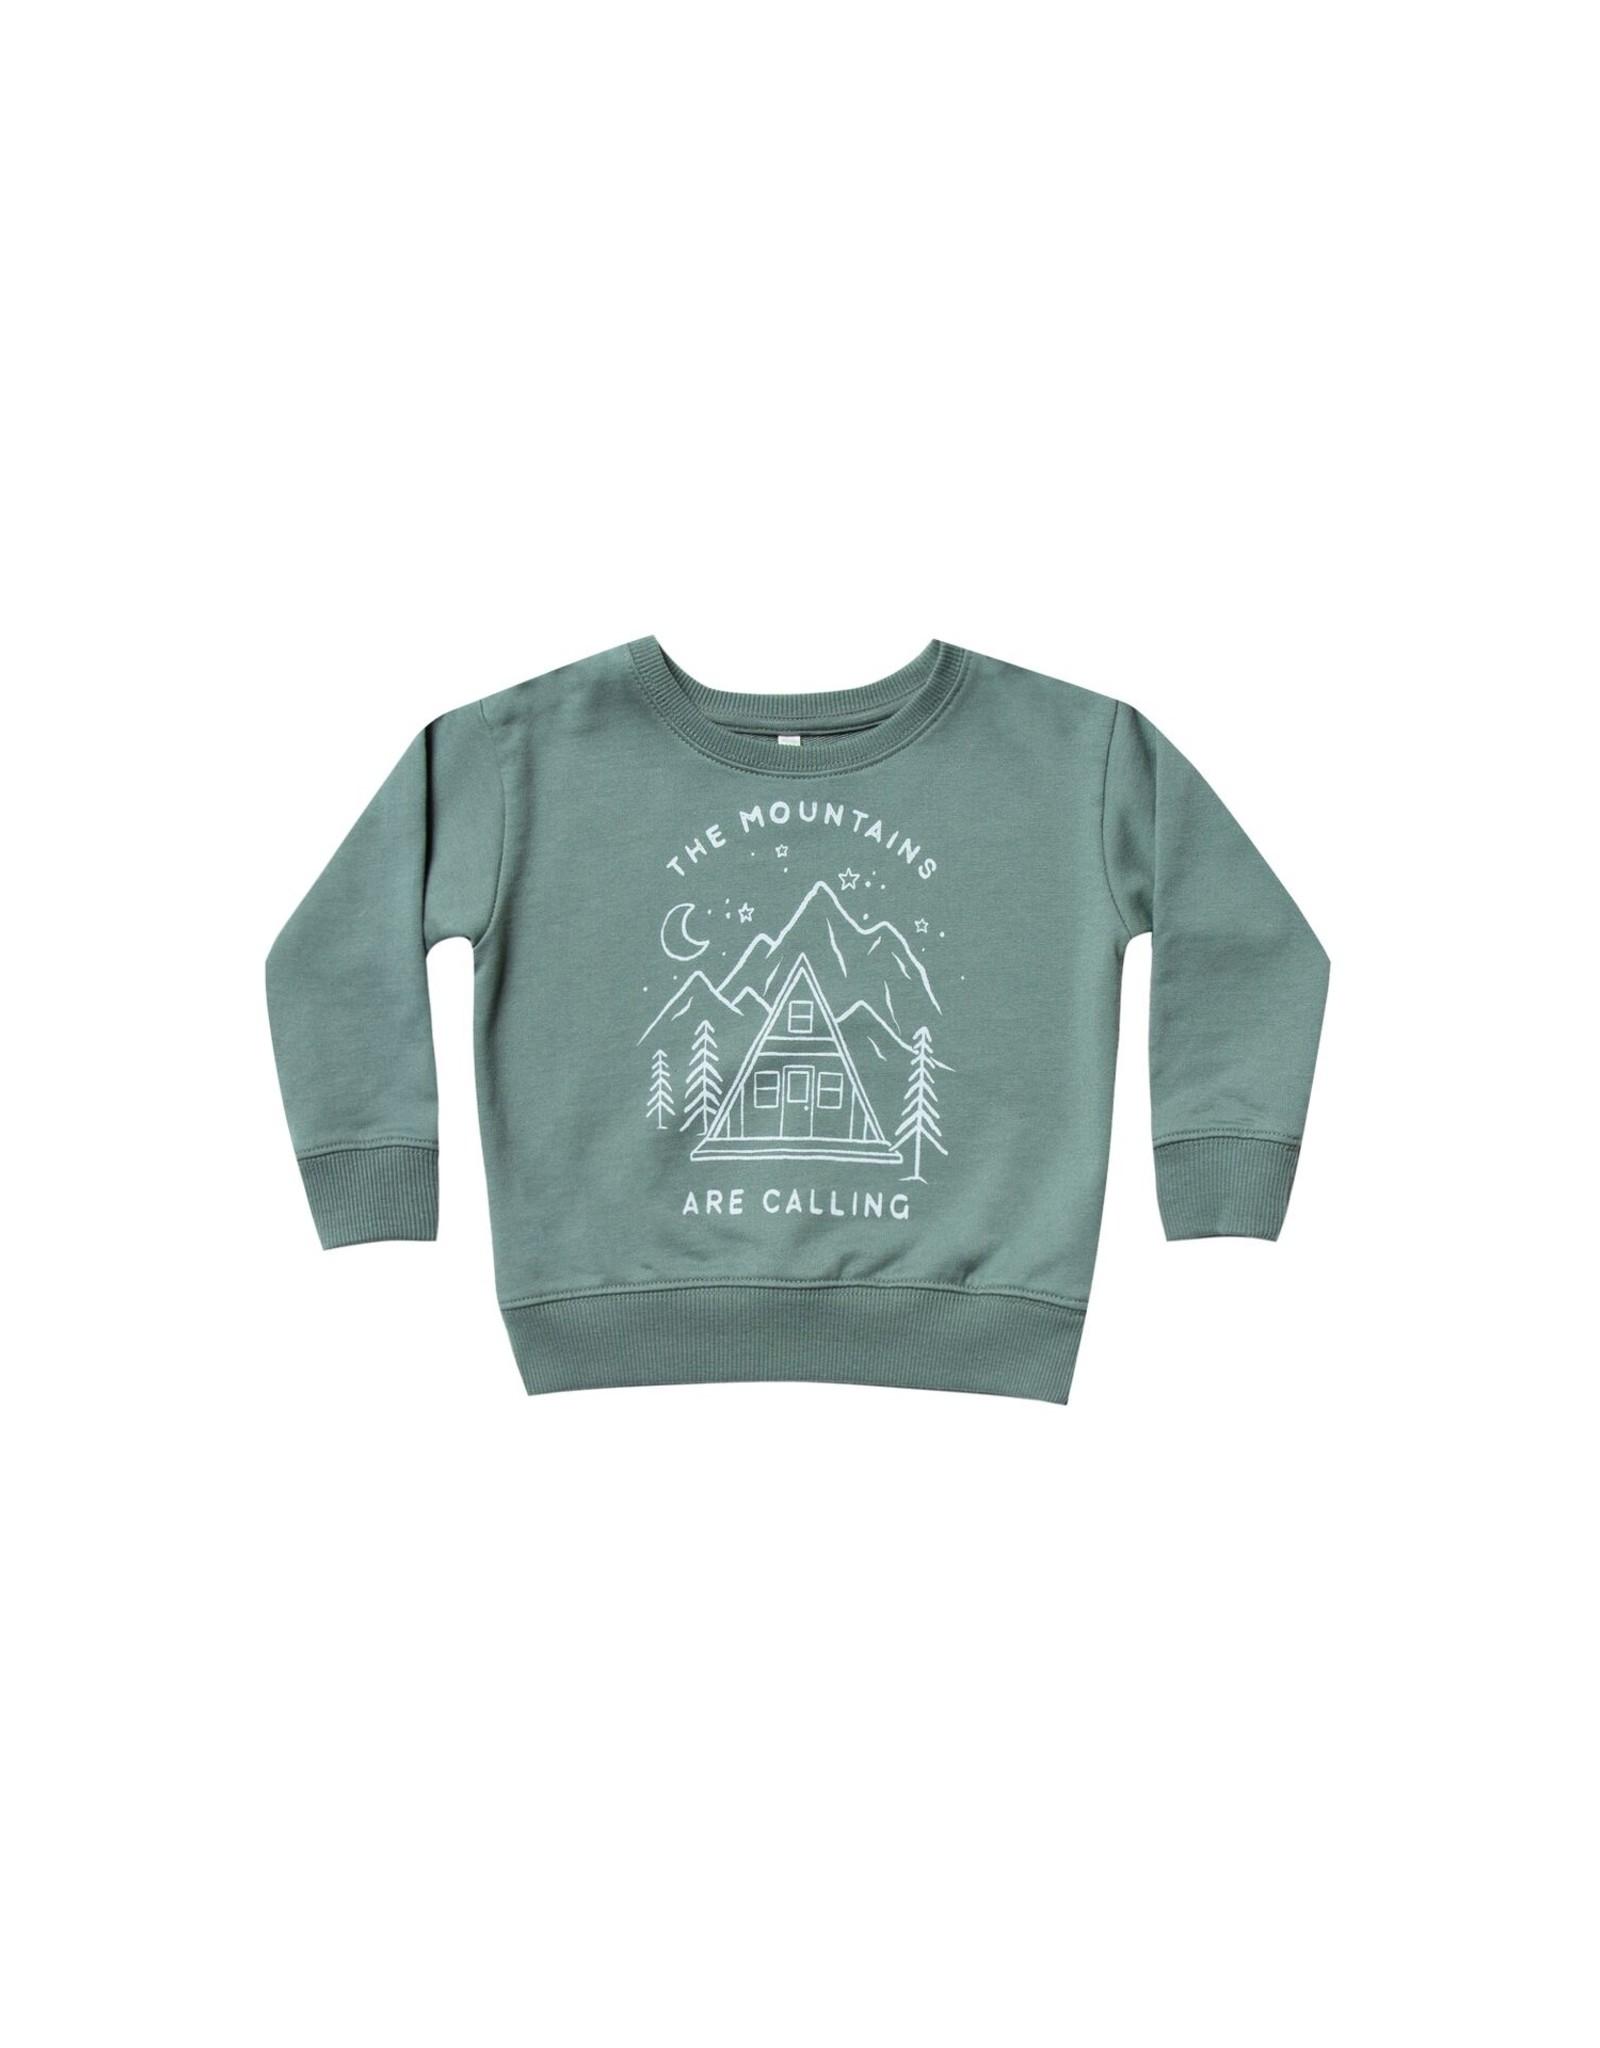 Rylee and Cru mountains are calling sweatshirt